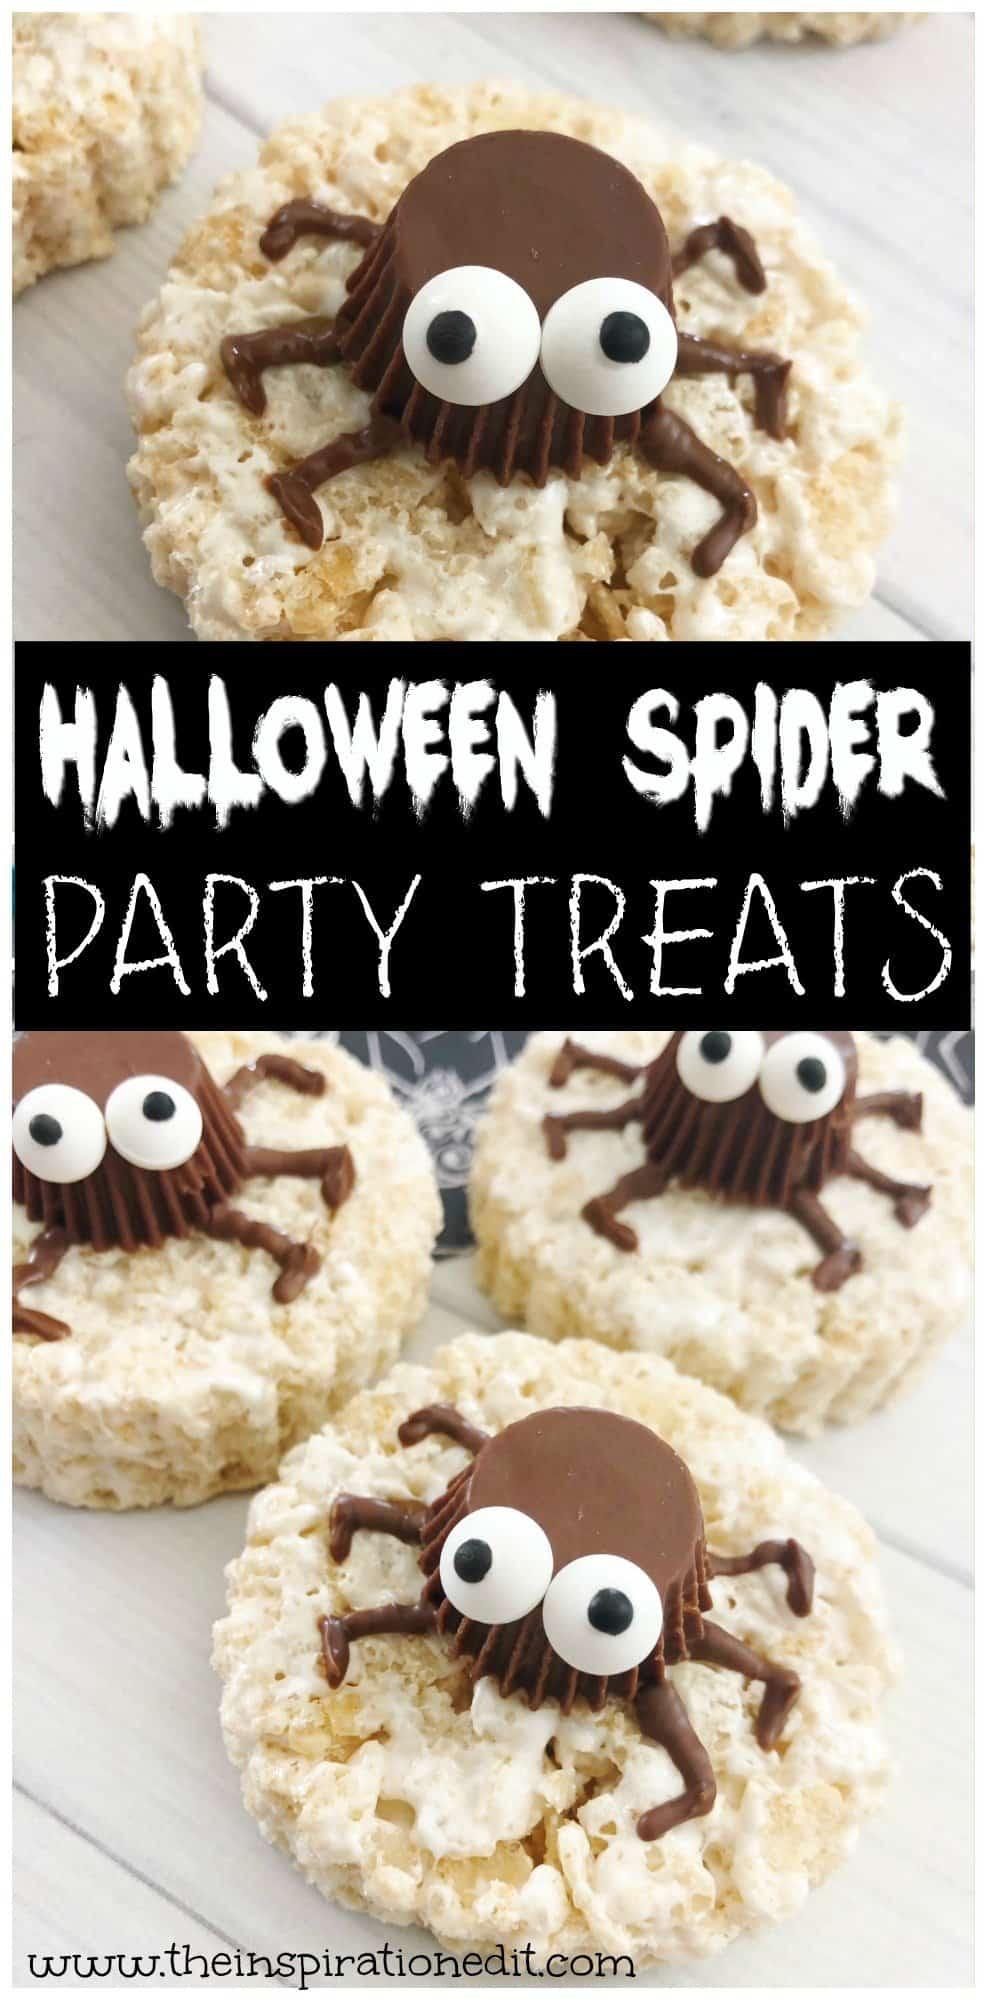 Spidery Halloween Rice Krispies Treat